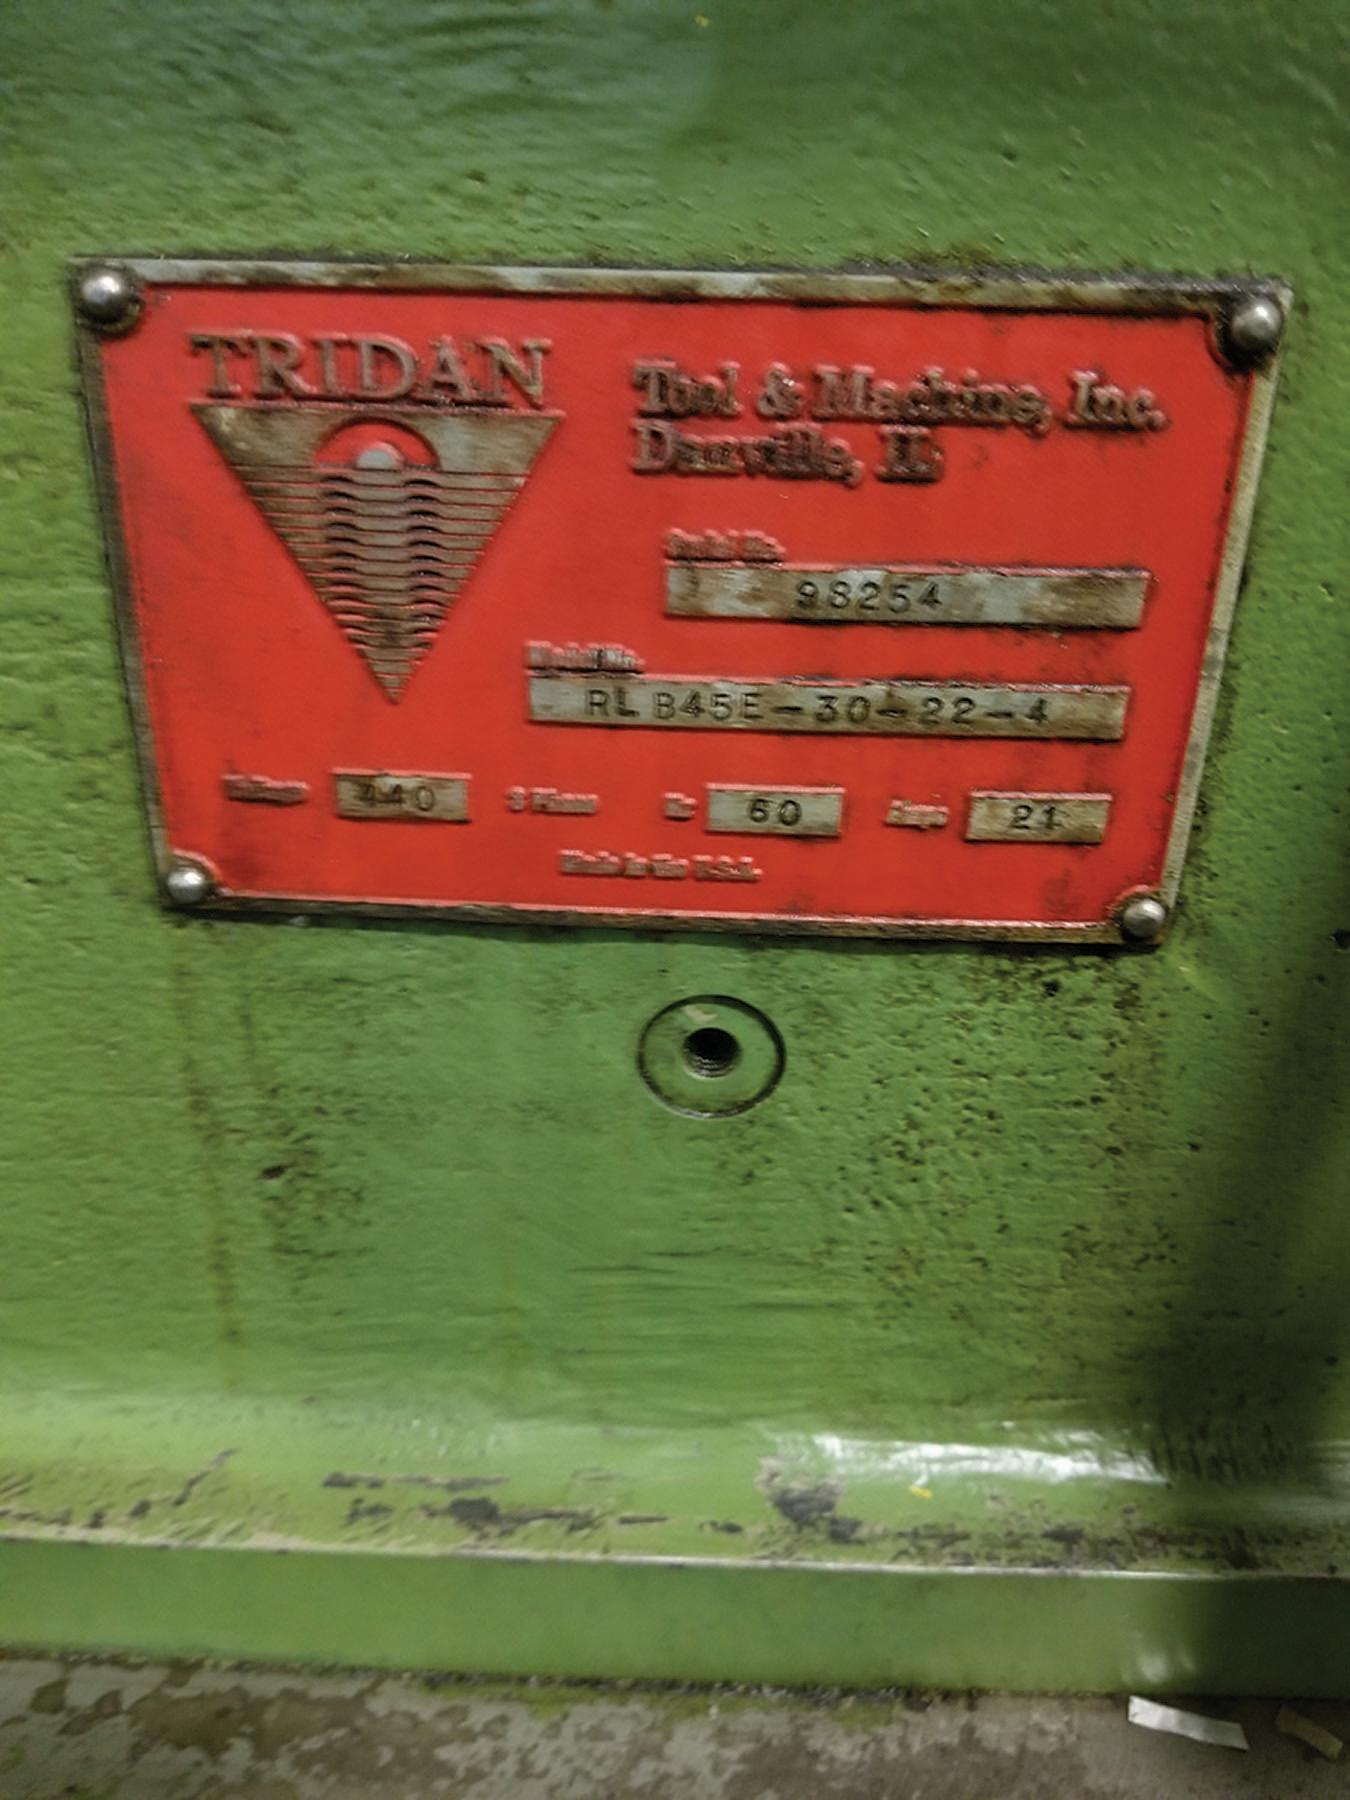 Lot 11 - TRIDAN FINN MACHINE, MODEL RL B45E-30-22-4, S/N 98254, INTEGRATED COIL REEL, TRIDAN TUBE BLOWER /